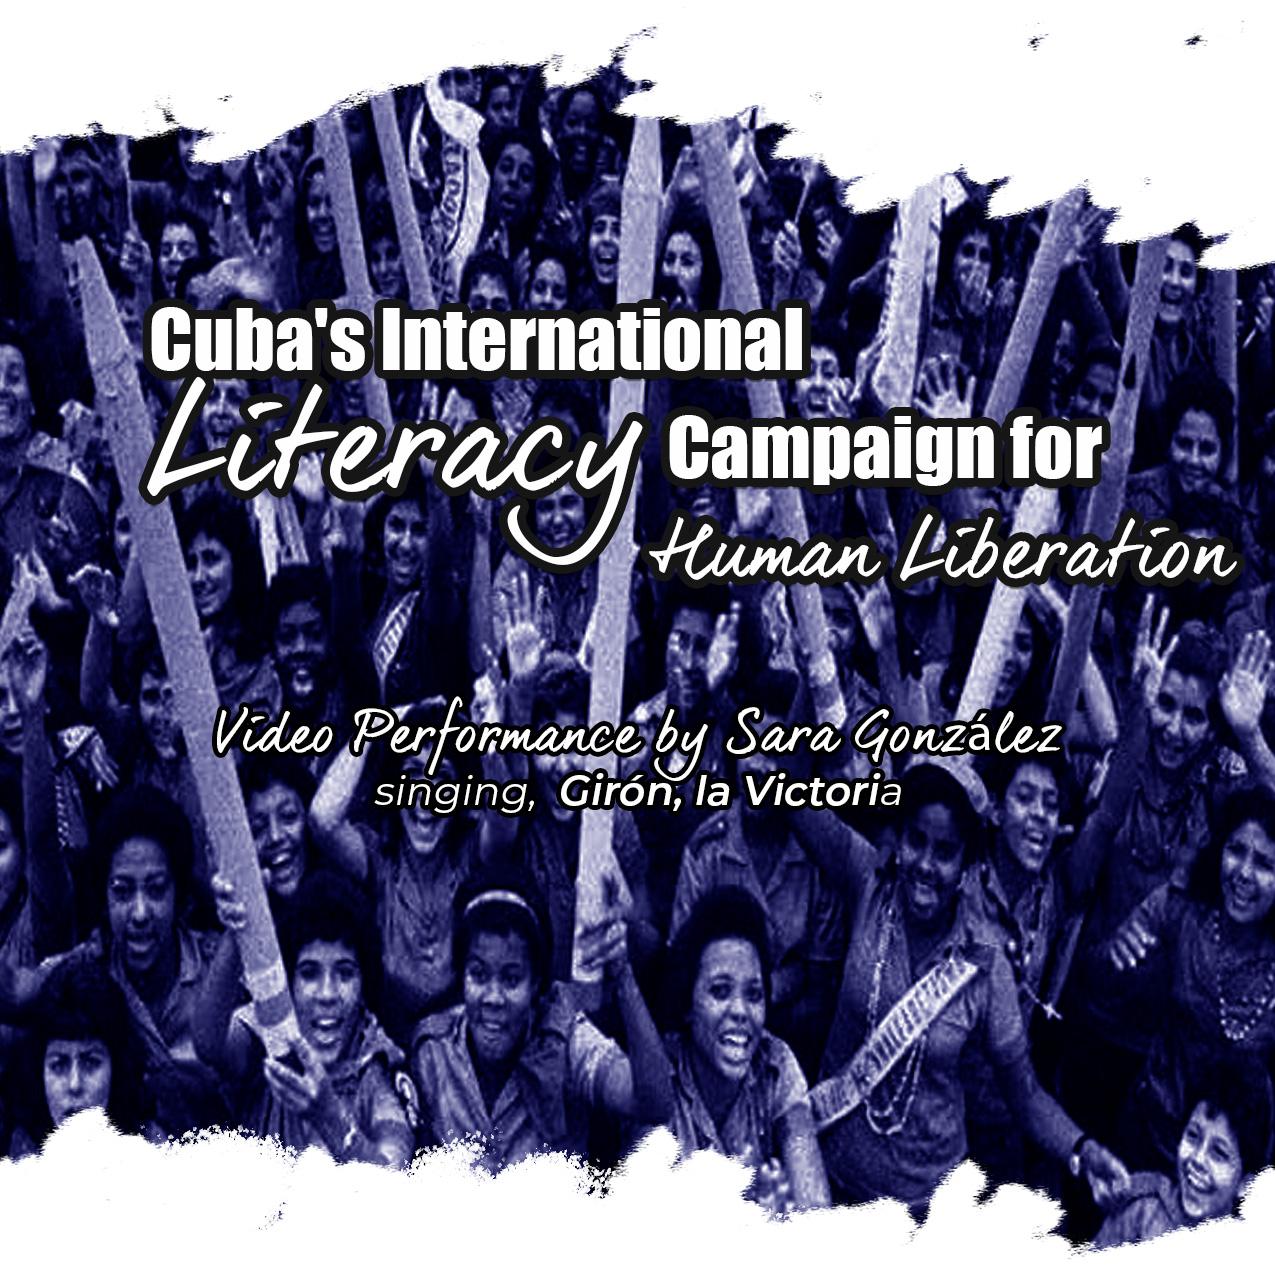 Cuban International Literacy Campaign for Human Liberation